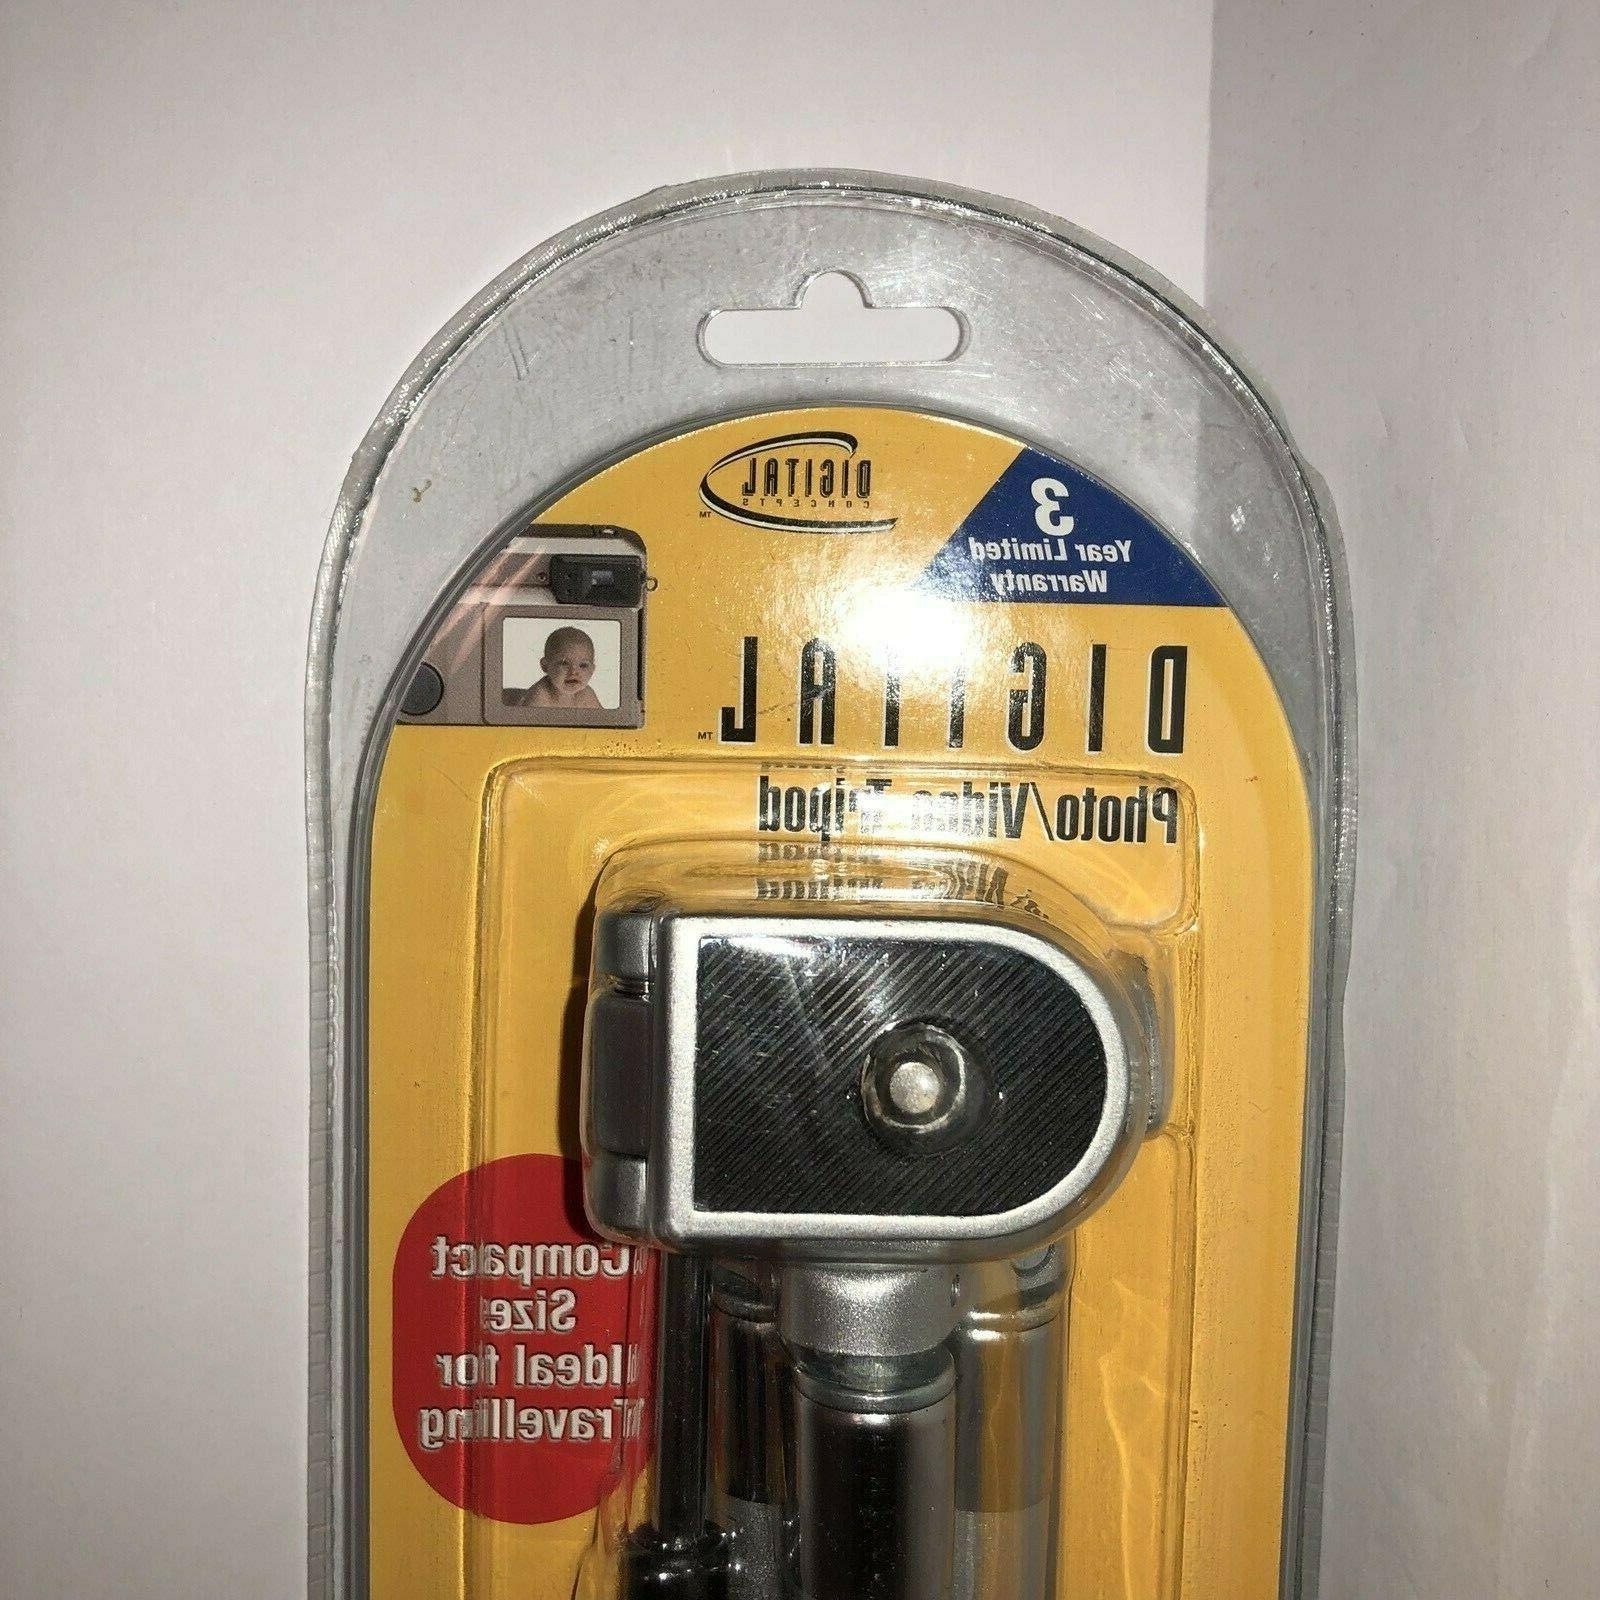 NIP Tripod Photo or Video, Portable Travel & Camcorders